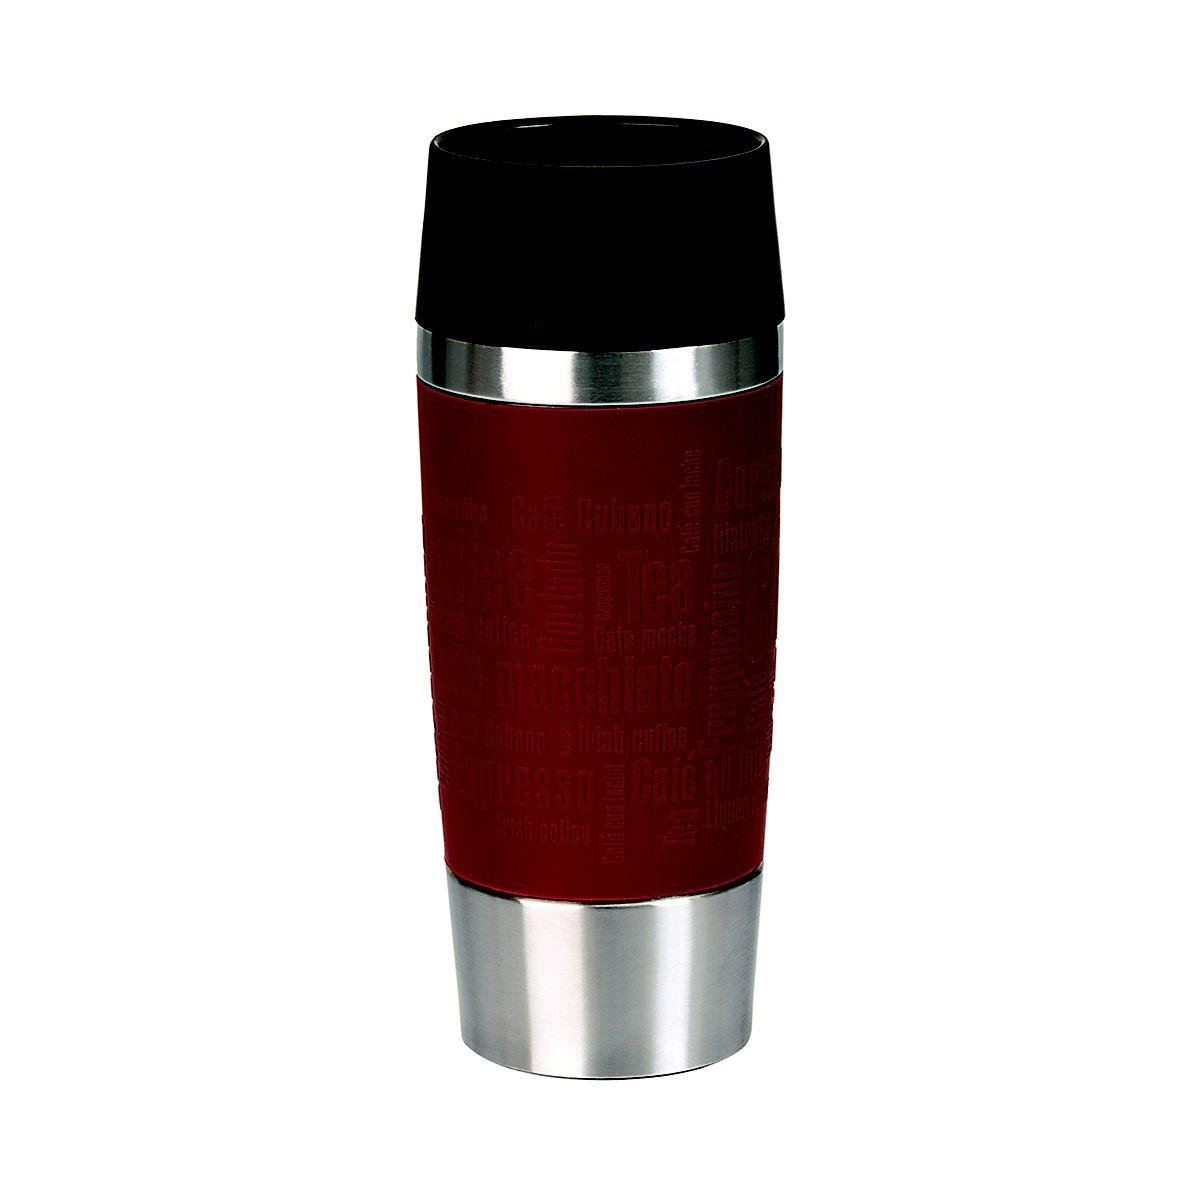 Mug isotherme emsa isotherme 0.36l inox/rouge (photo)